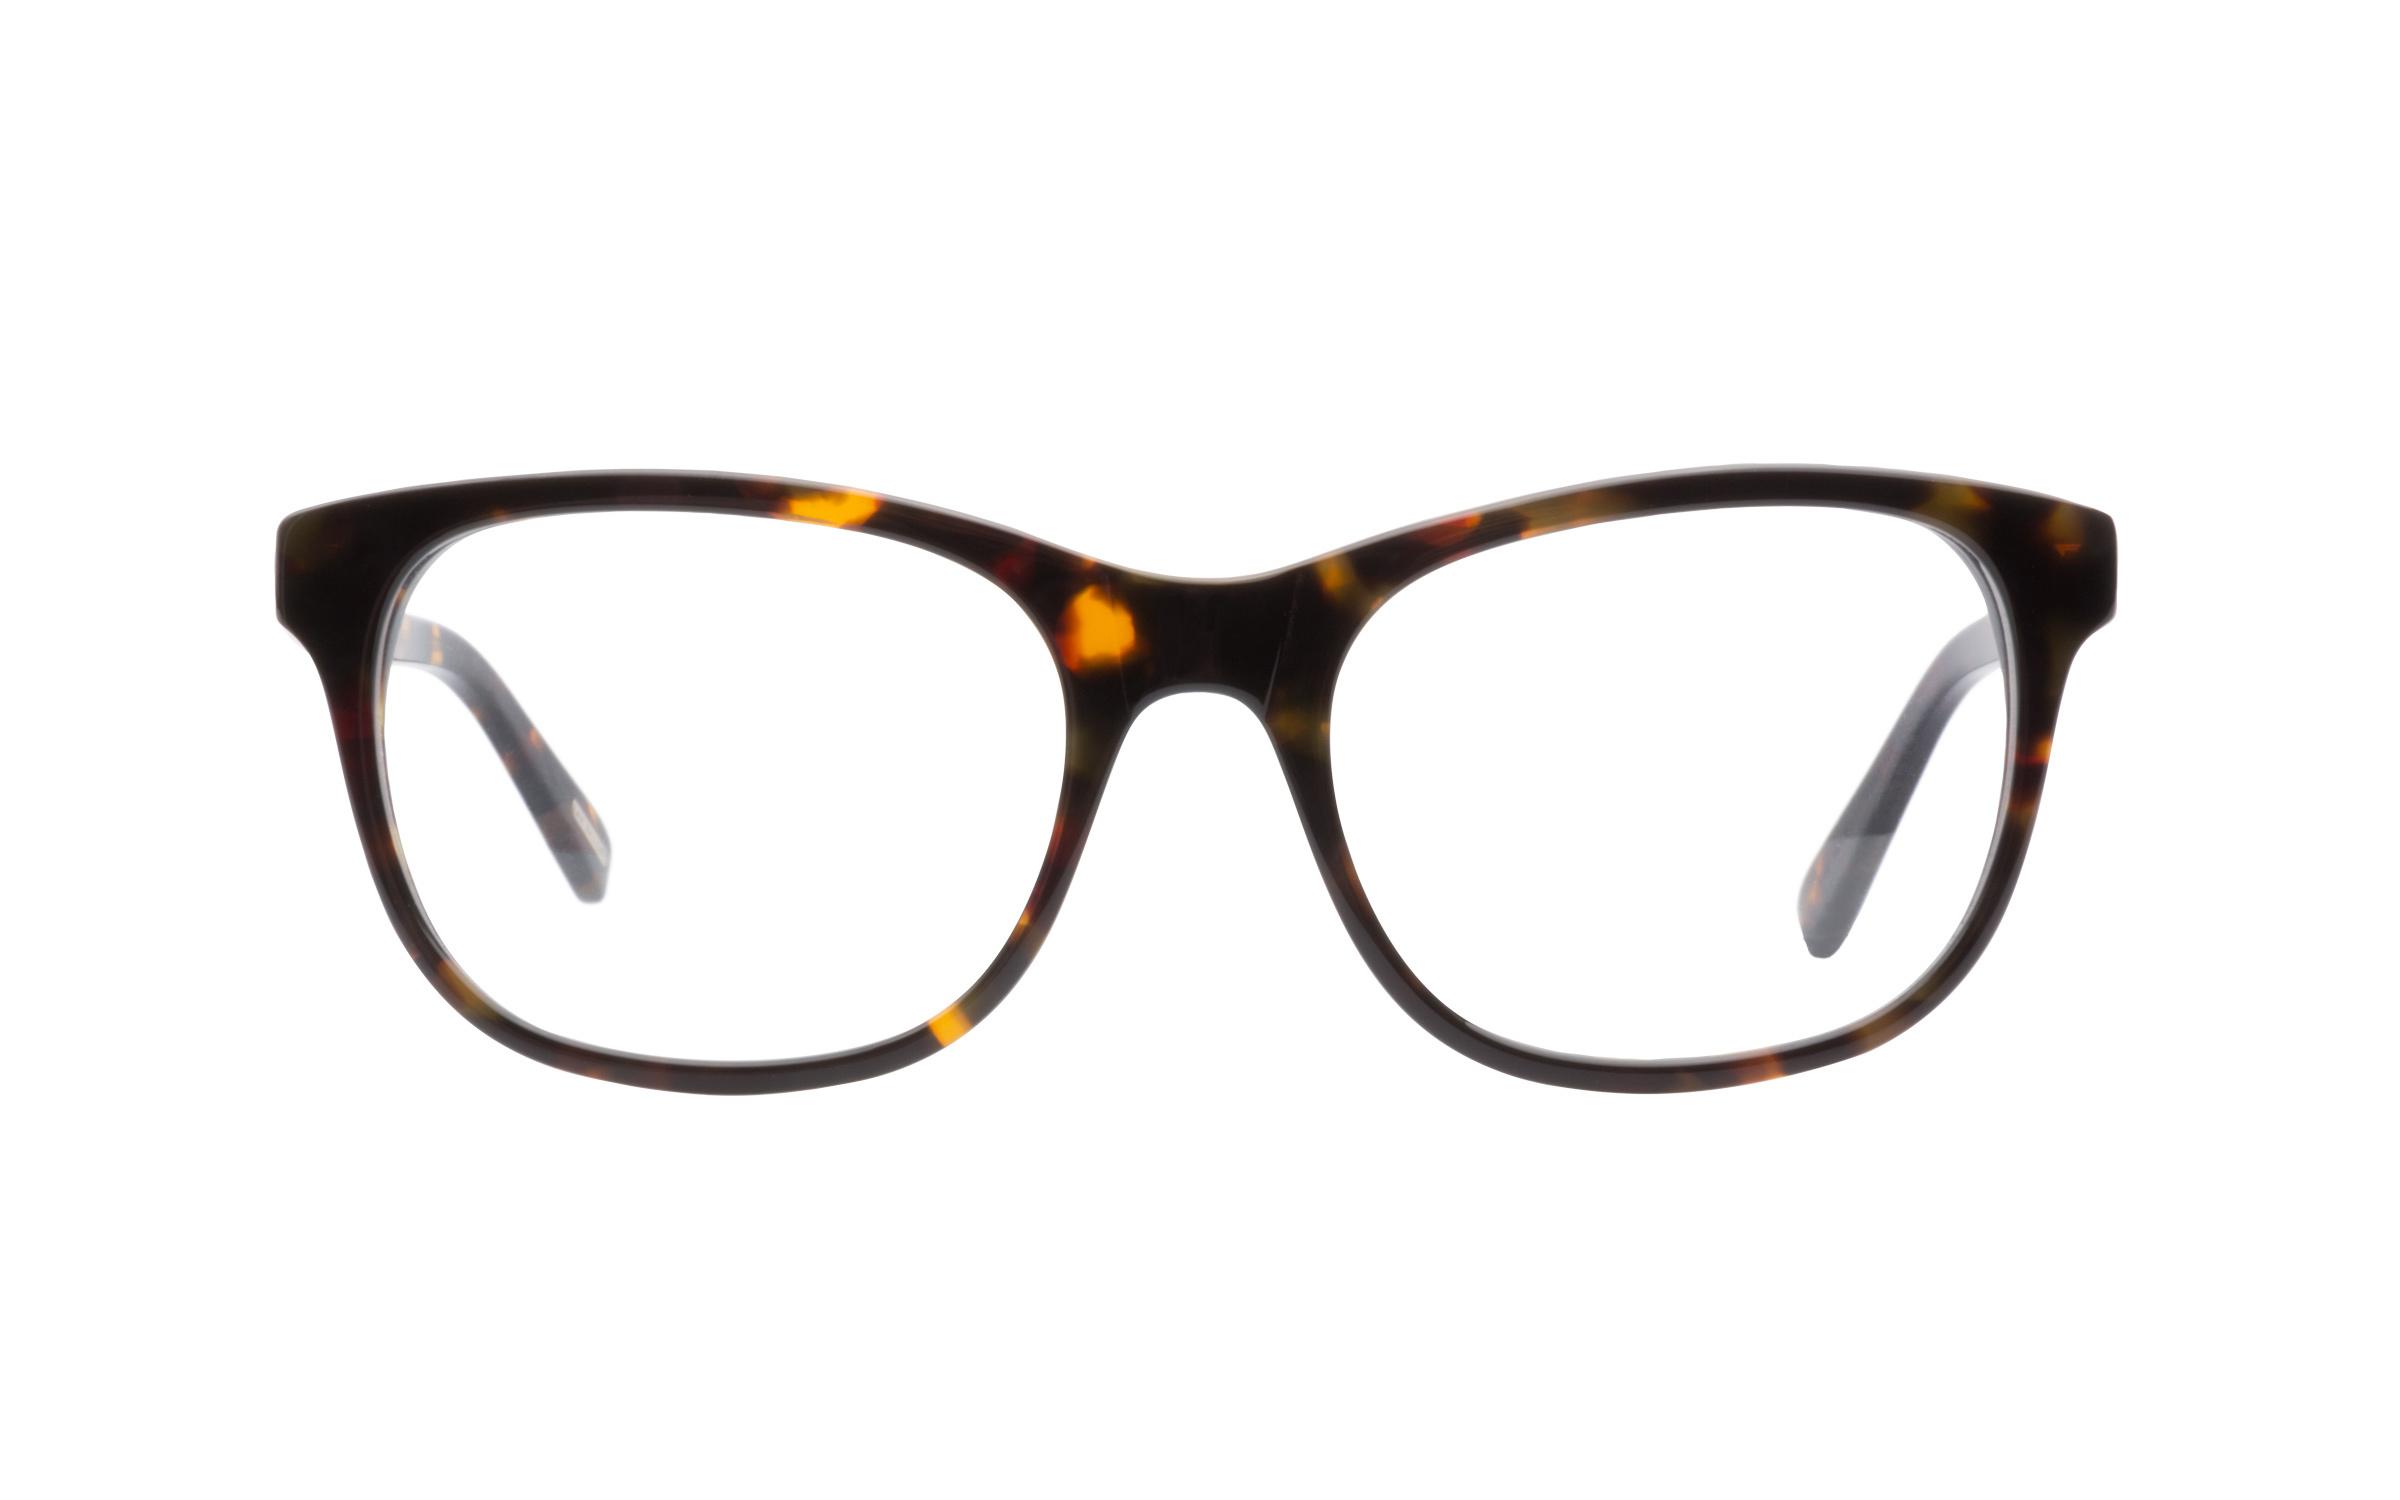 Kam_Dhillon_Womens_Glasses_Retro_Tortoise_Acetate_Online_Coastal